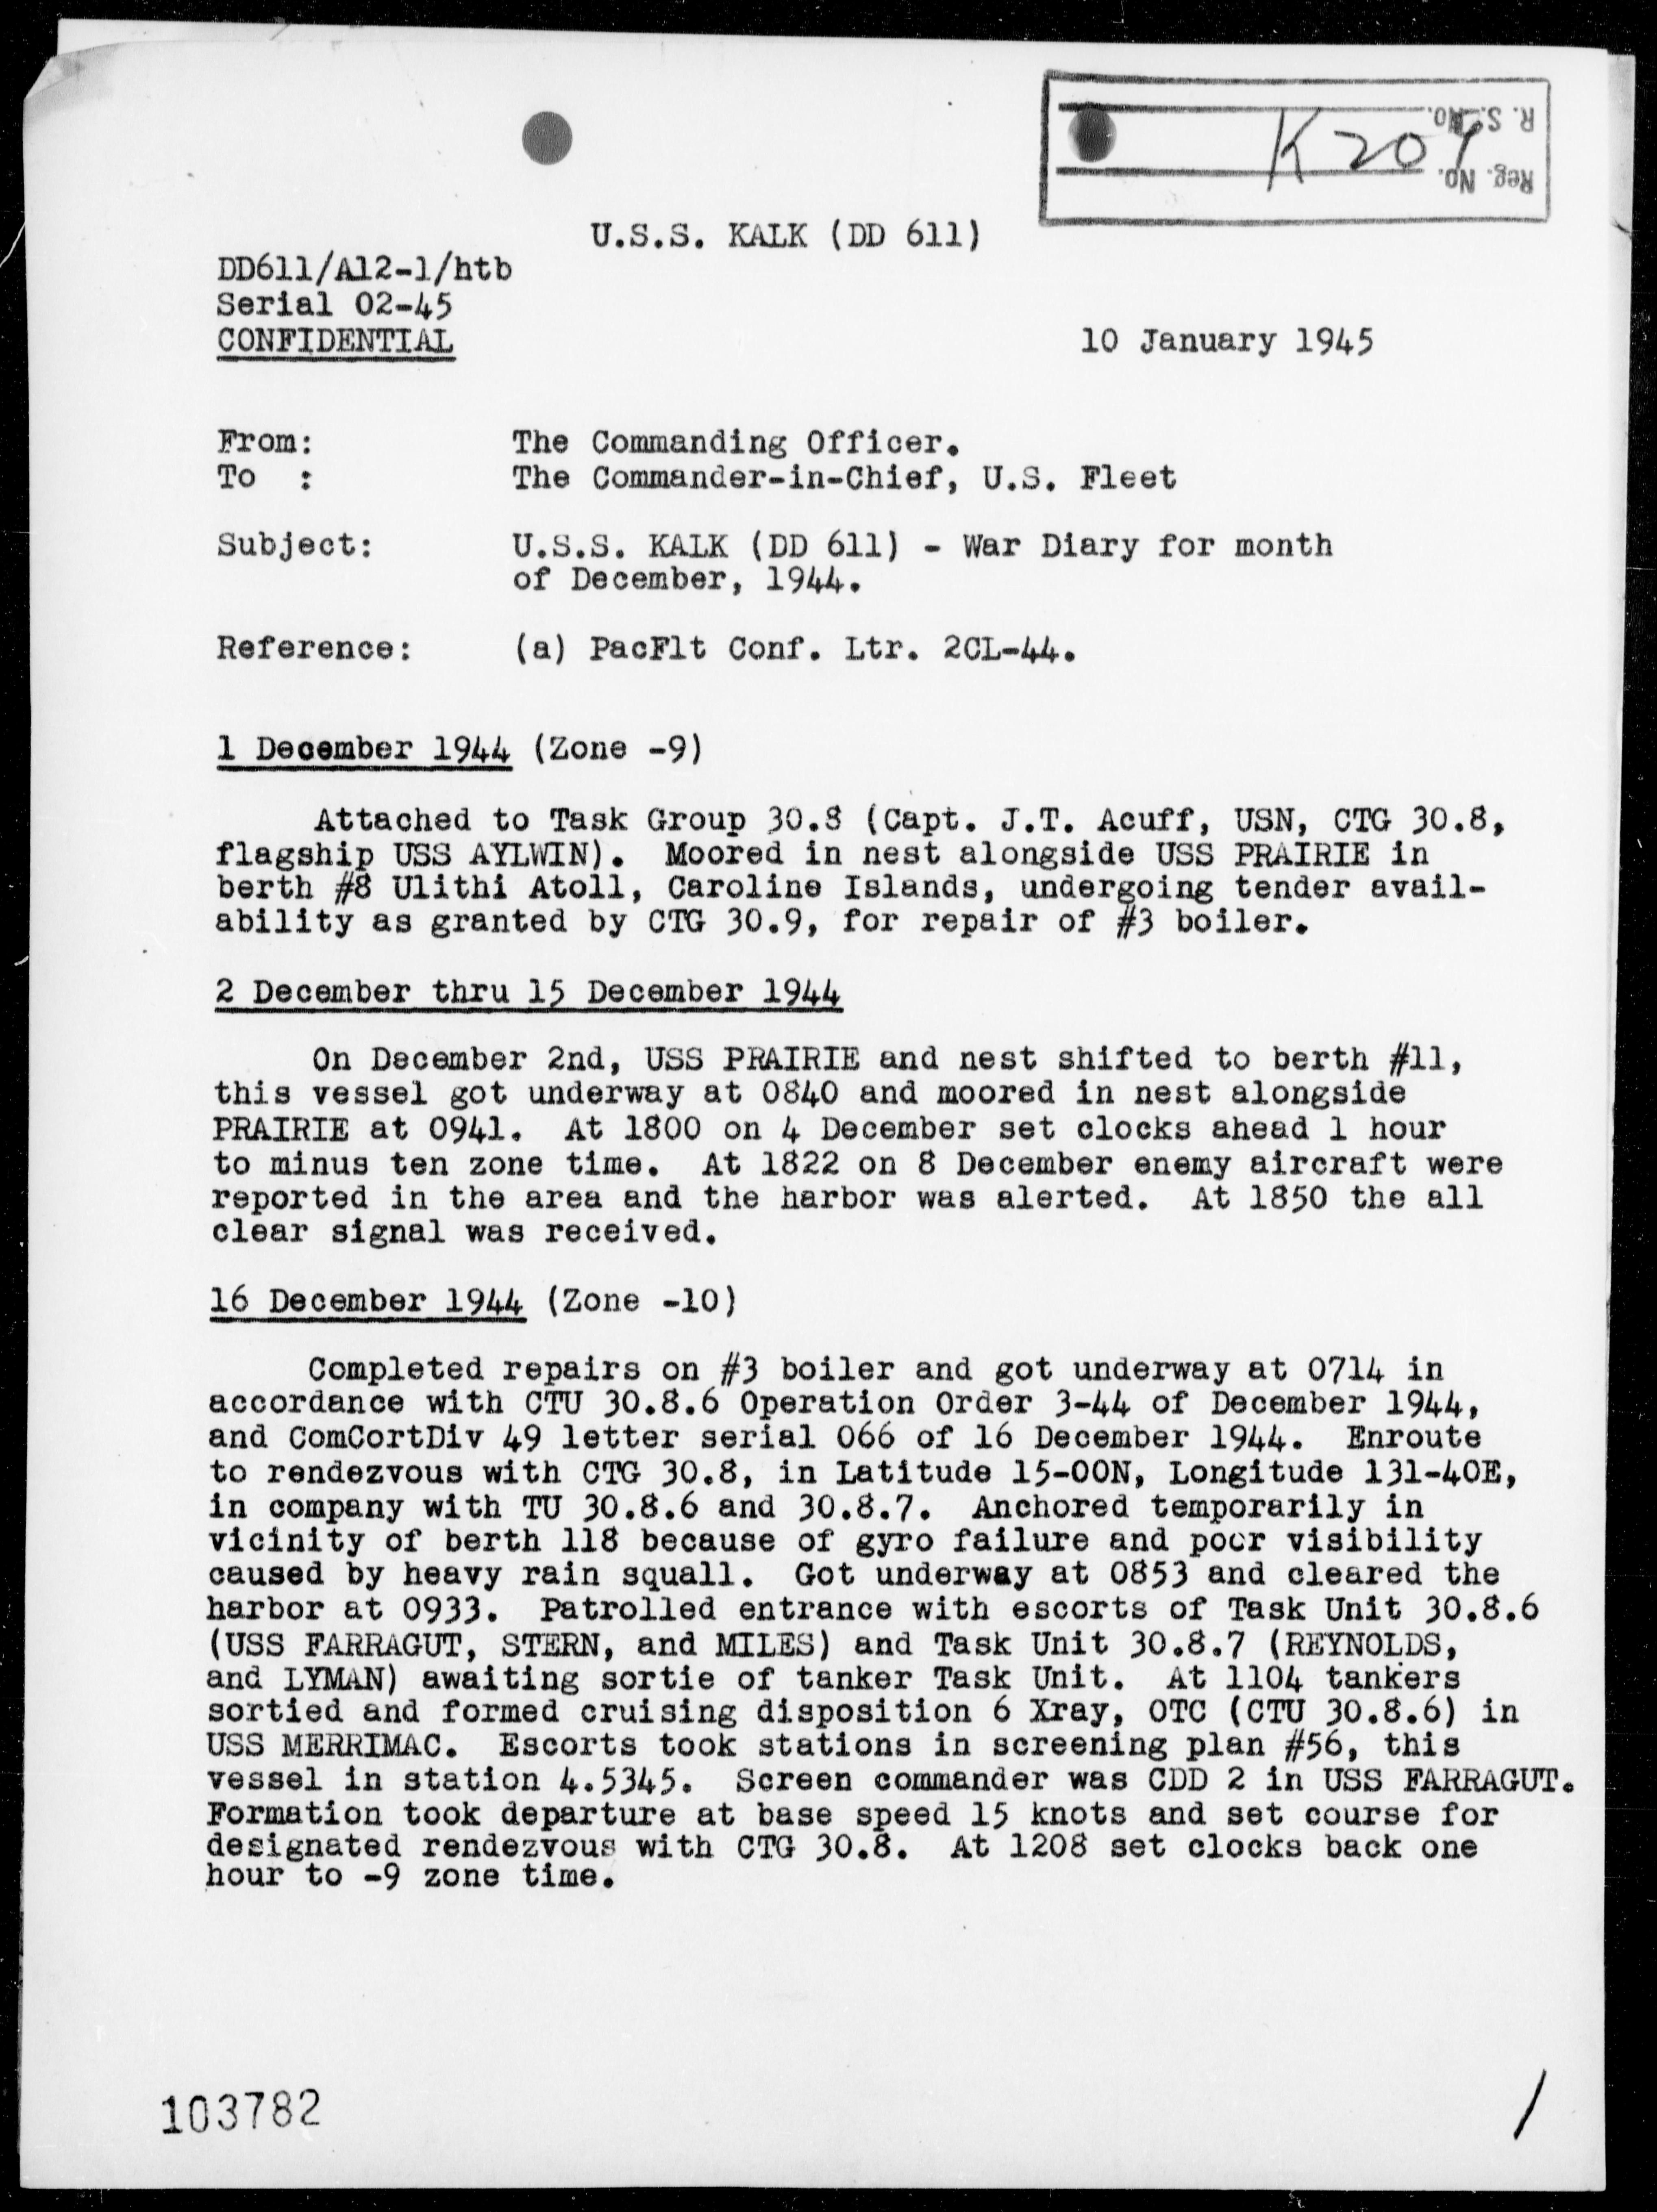 USS KALK - War Diary, 12/1-31/44